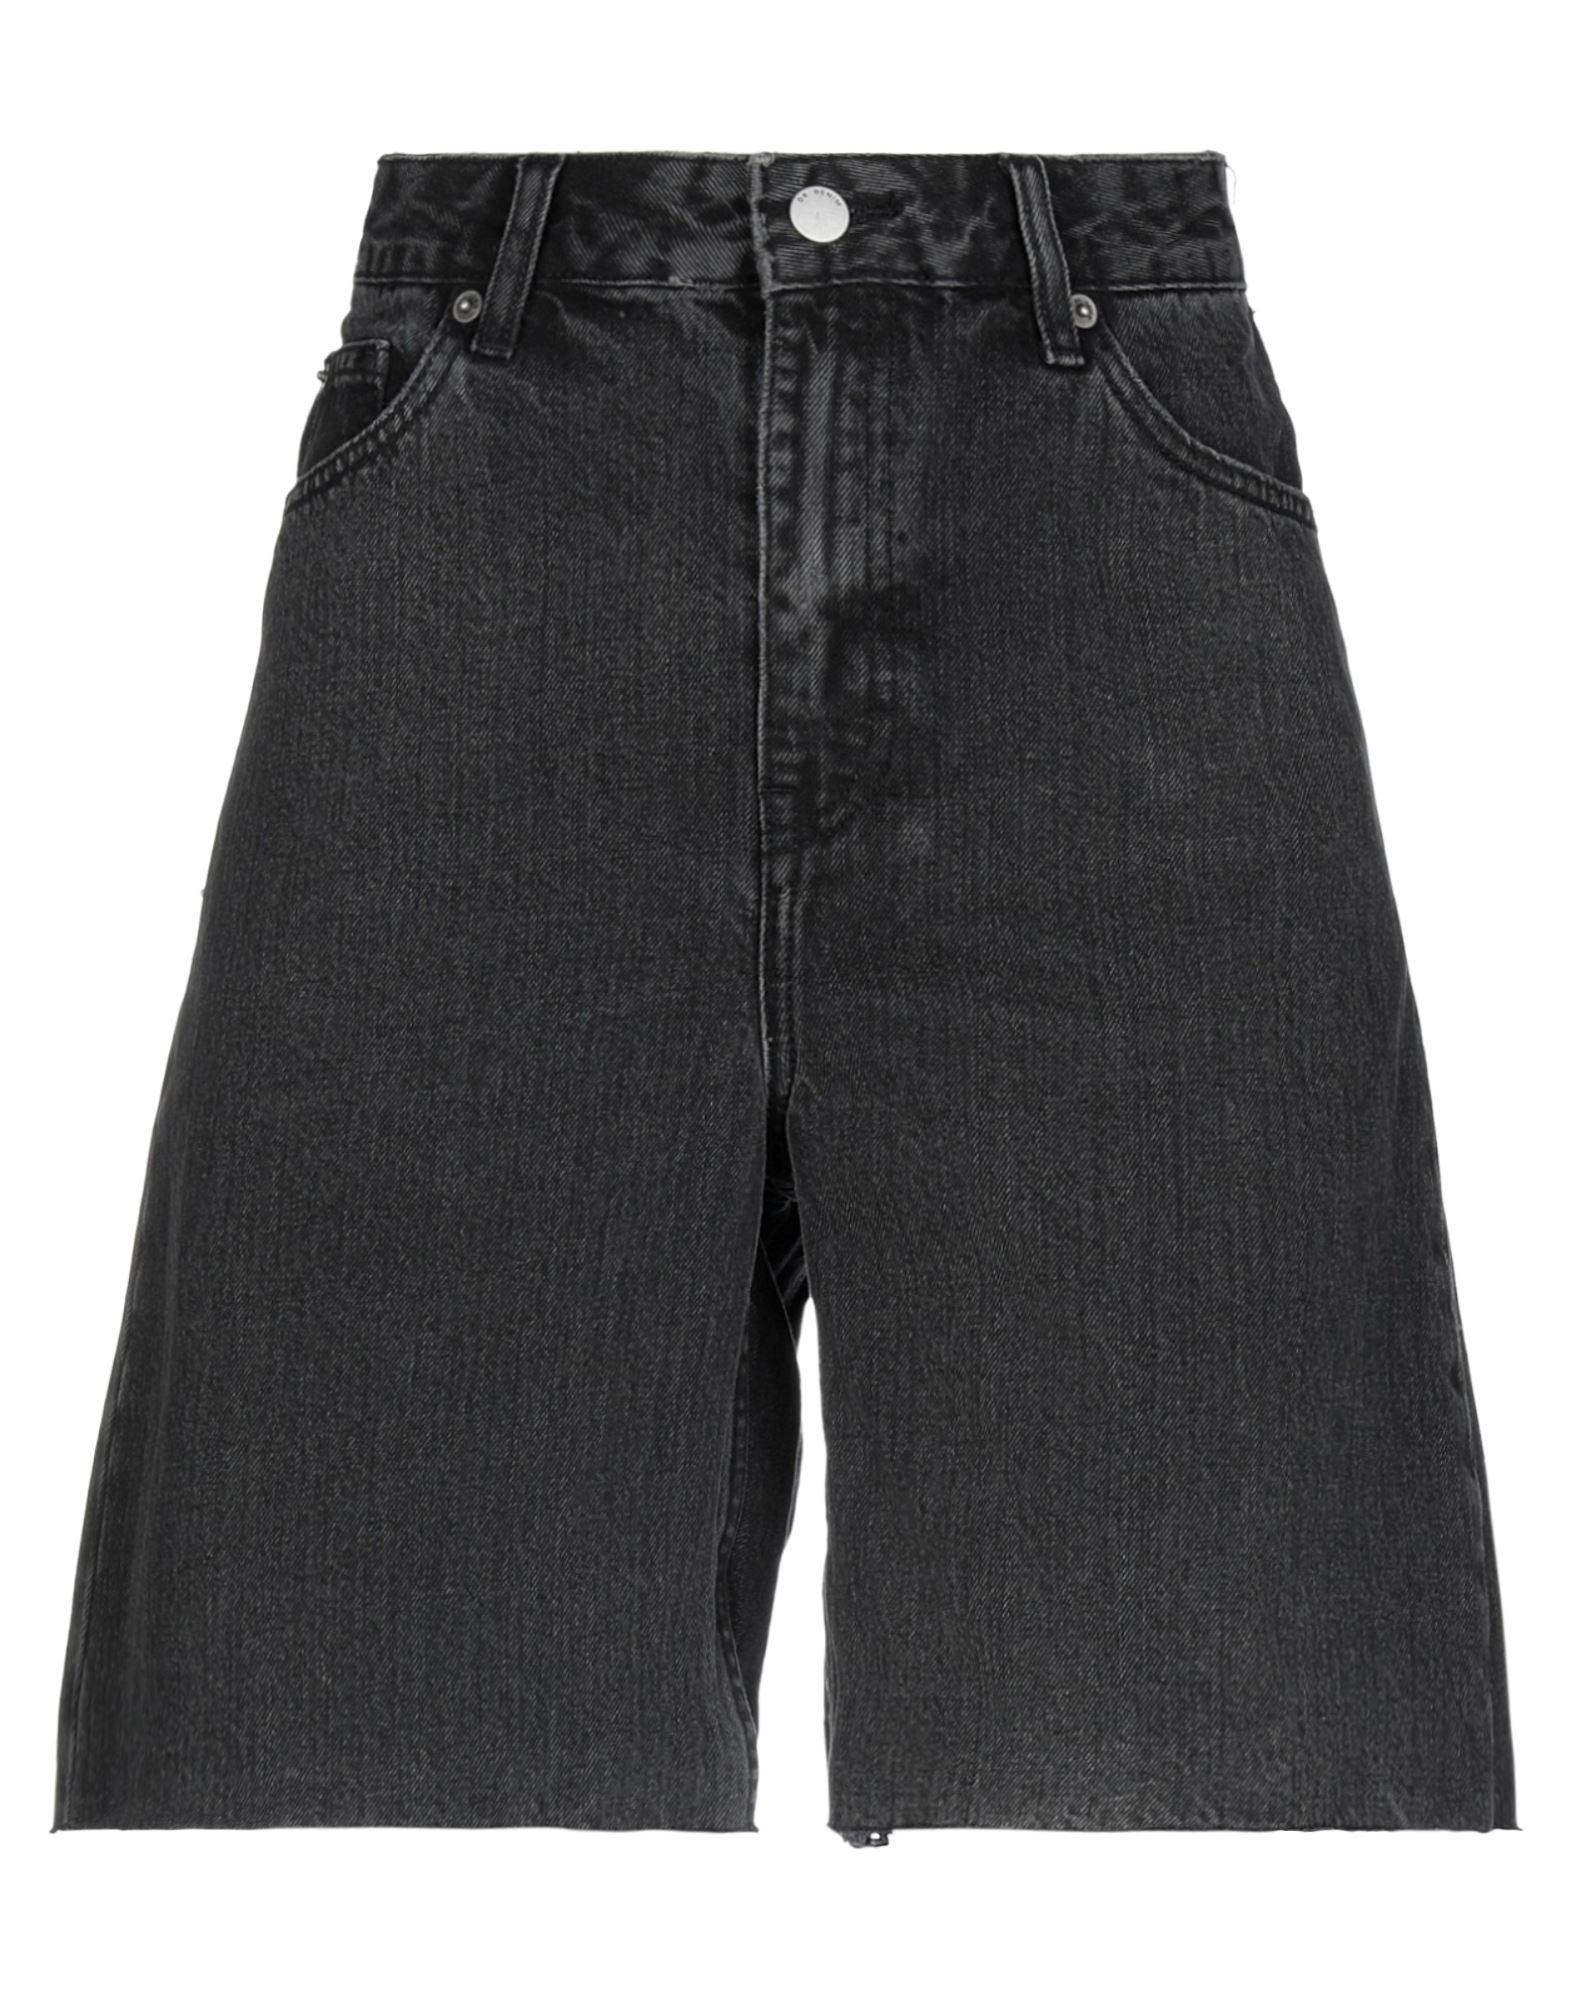 DR. DENIM JEANSMAKERS Джинсовые бермуды dr denim jeansmakers джинсовые брюки капри